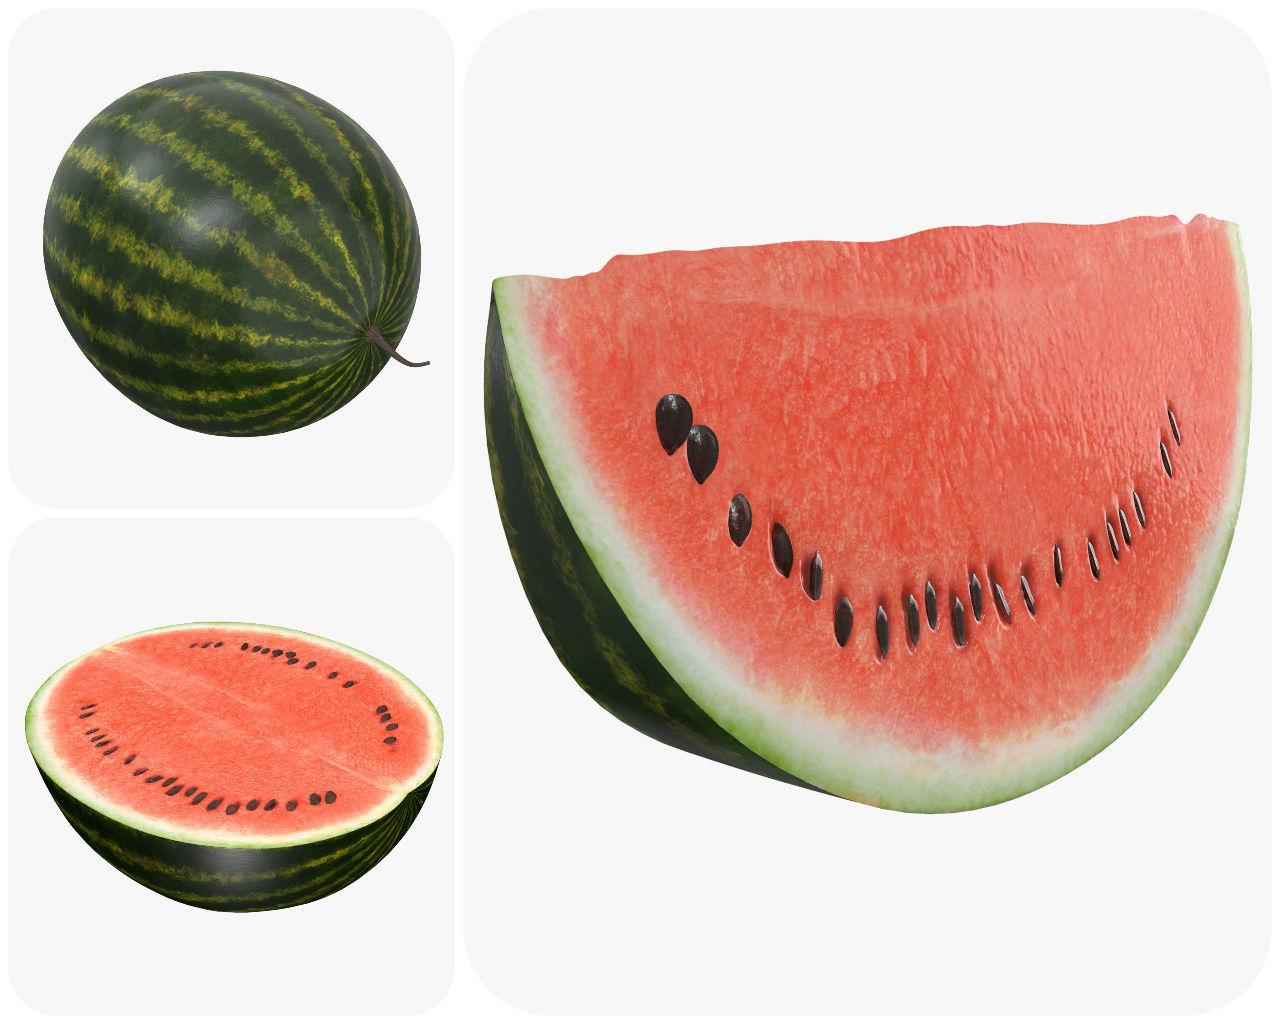 Realistic watermelon whole half sliced